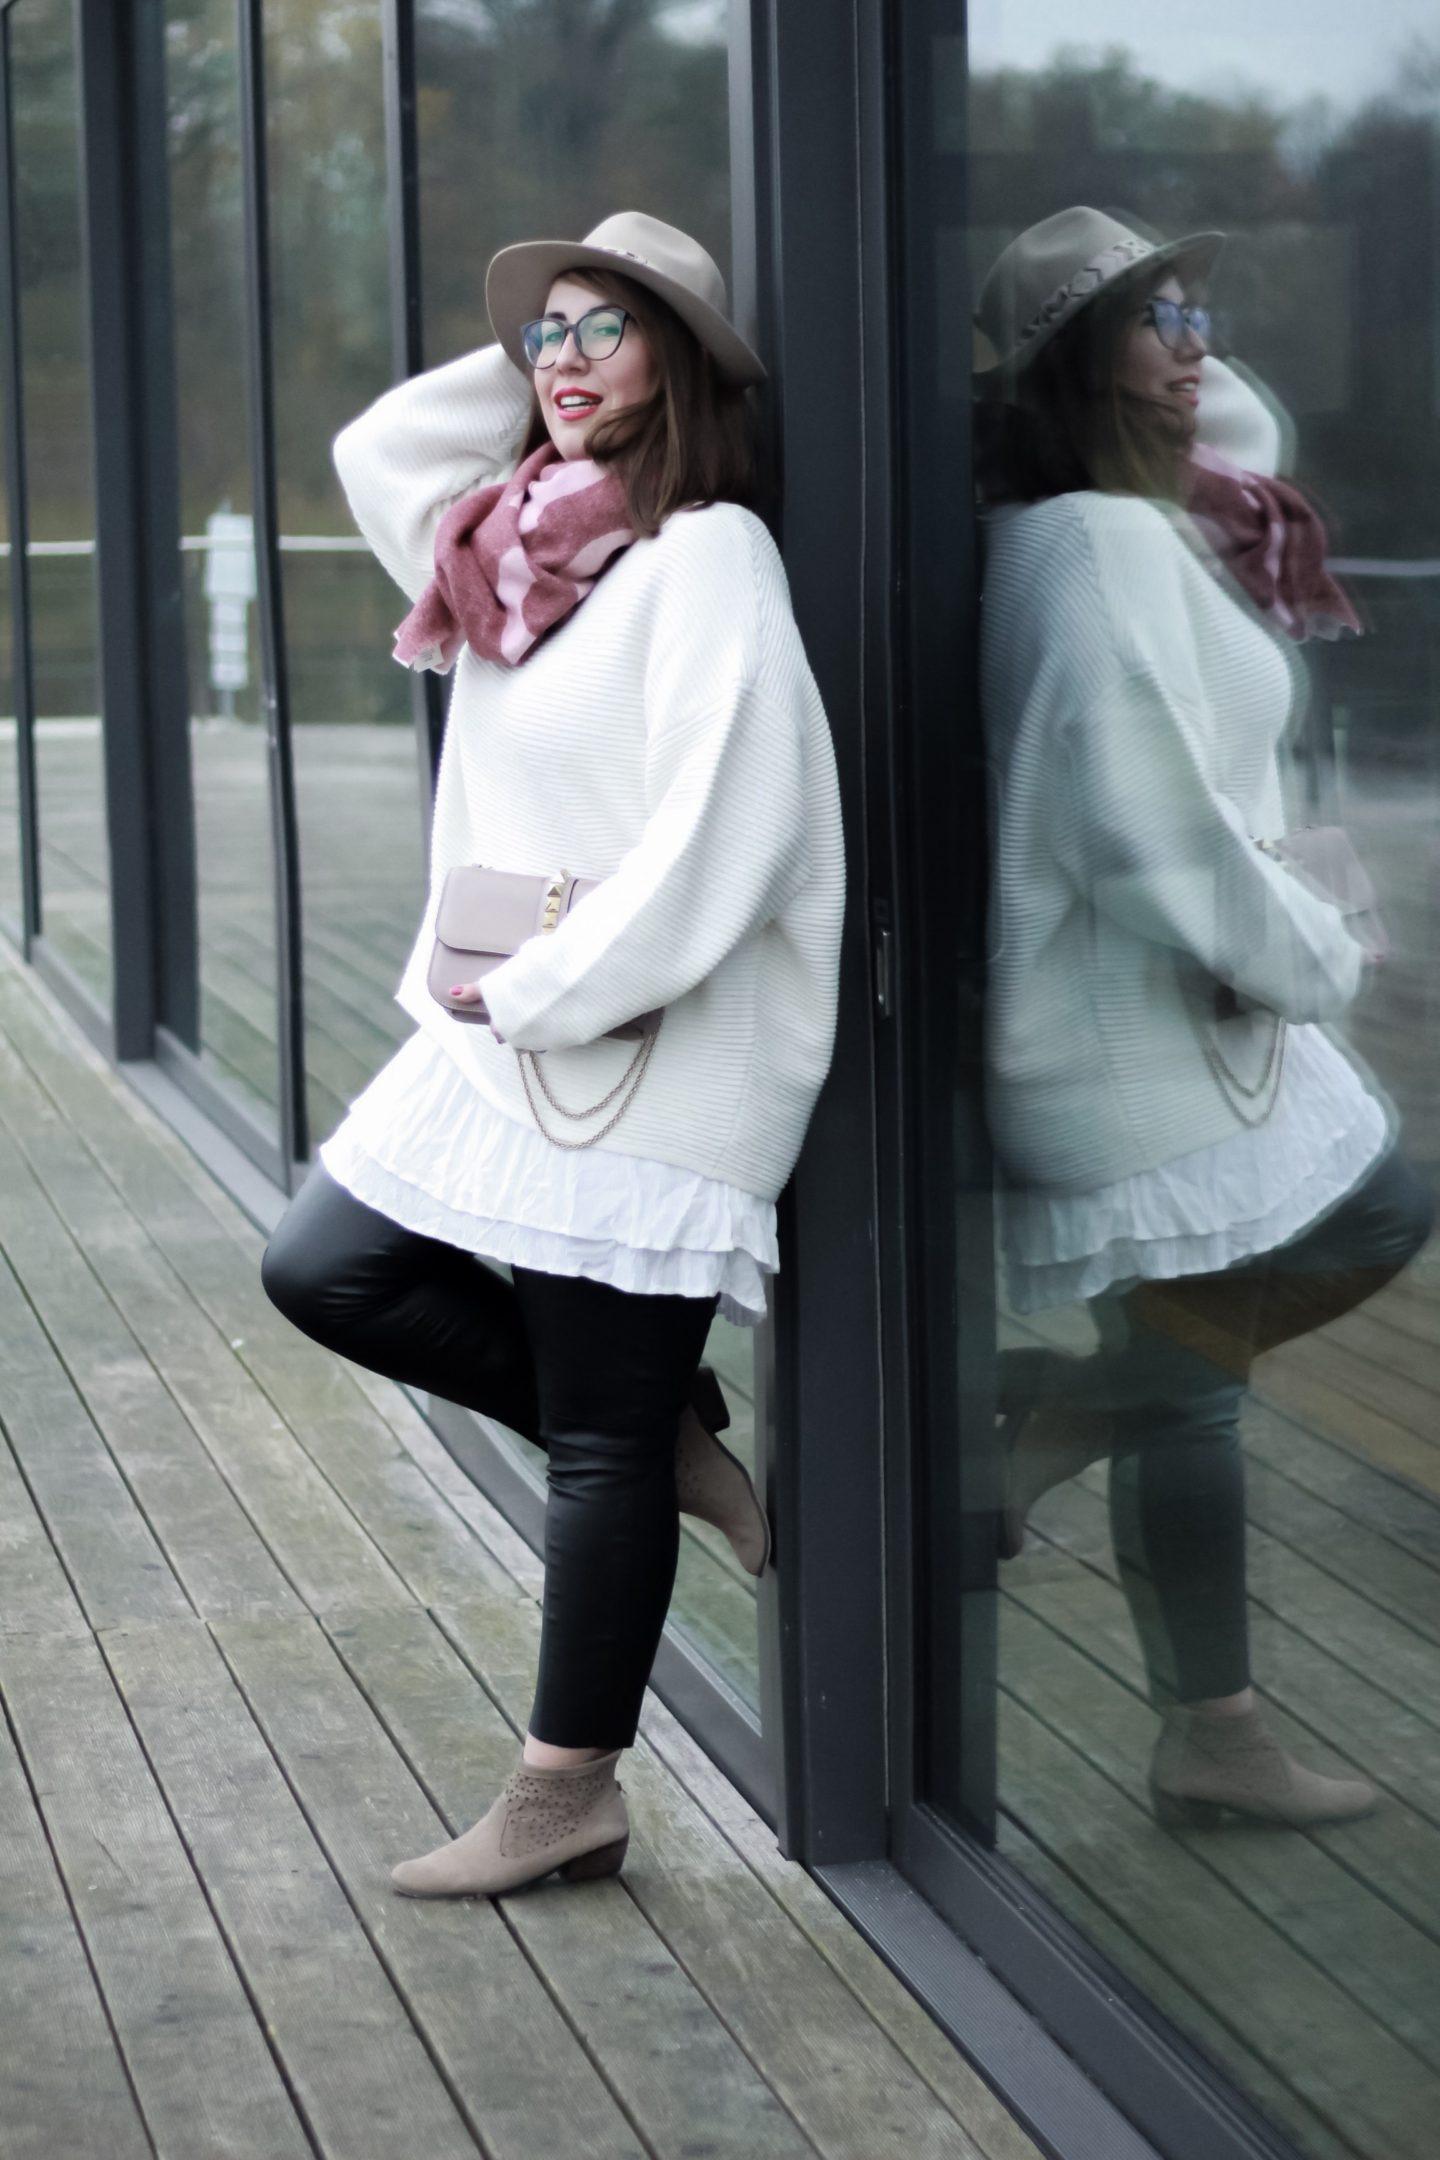 Miss-Suzie-Loves-Susanne-Heidebach-Acne-Studios-Toronty-Schal-Scarf-Valentino-Glam-Lock-Tasche-Poudre-Outfit-Herbstoutfit-Trendreport-Logomania